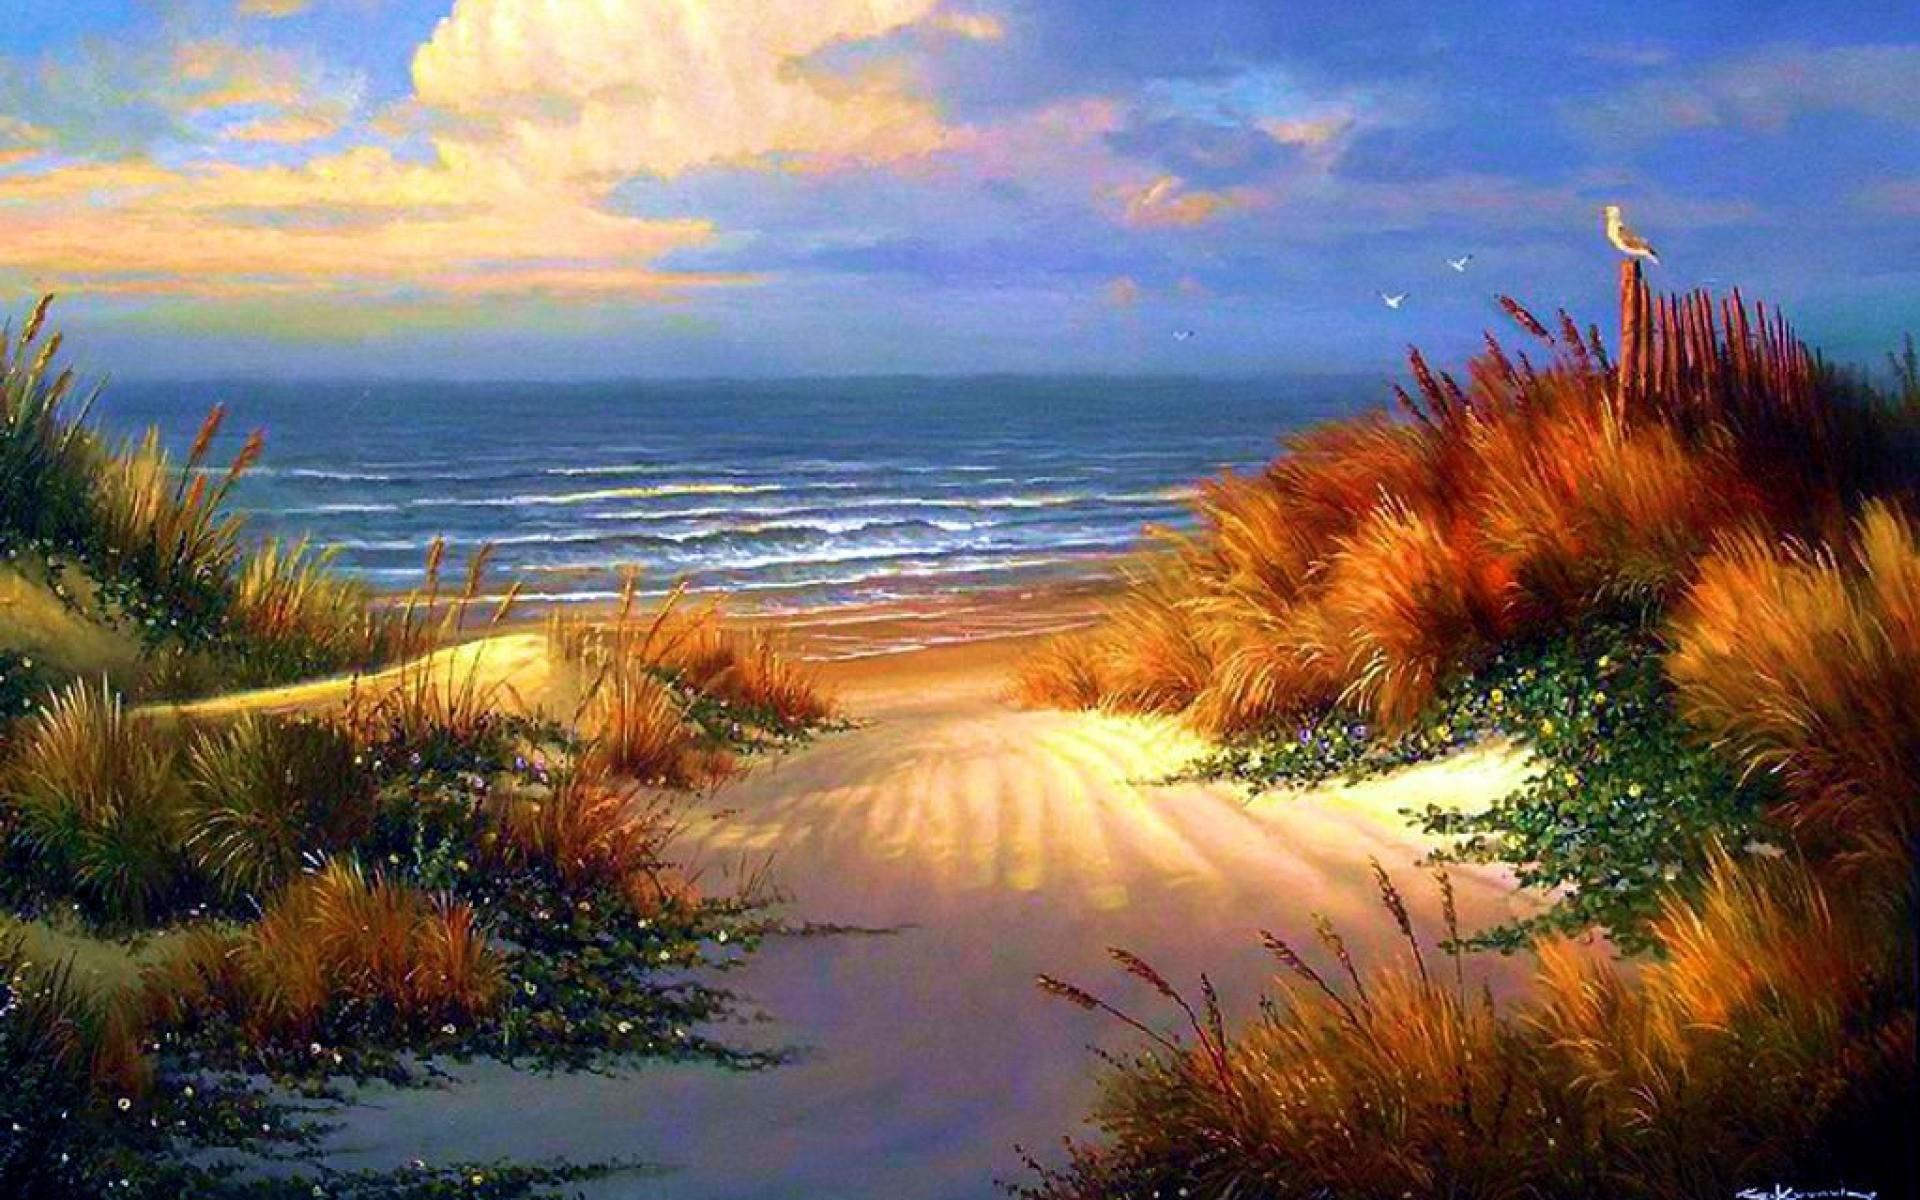 Calm Ocean & Beautiful Beach wallpapers and stock photos